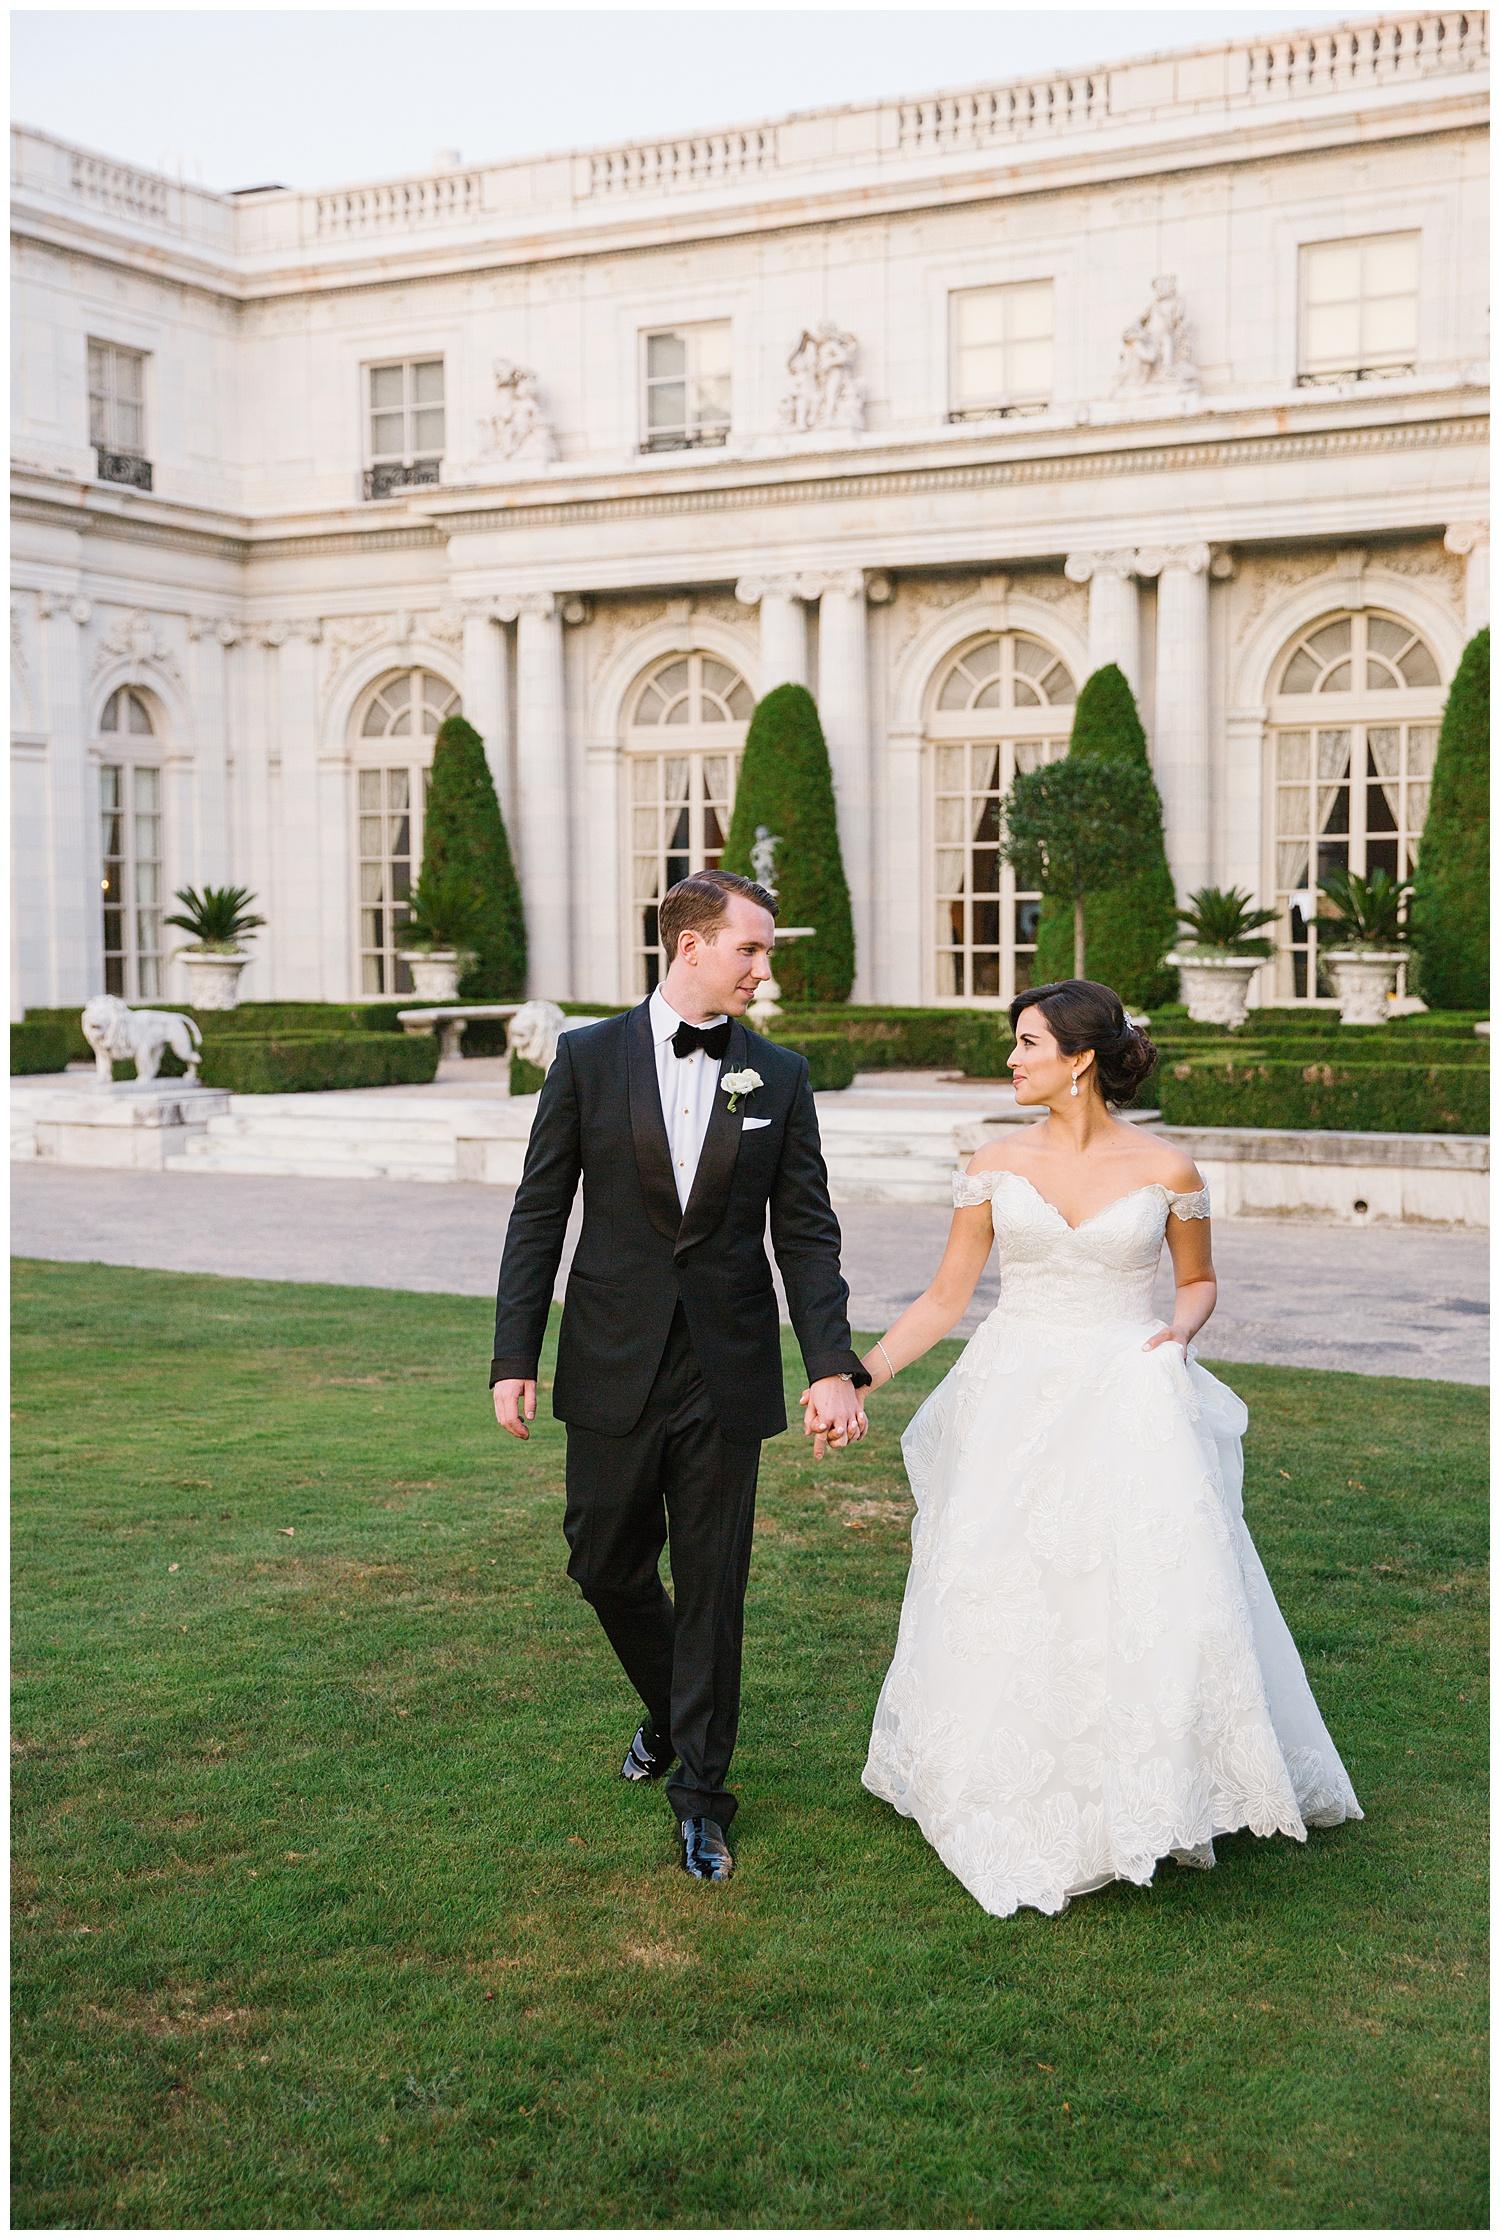 Stephen_Nathalie_Rosecliff_Mansion_Wedding_025.jpeg